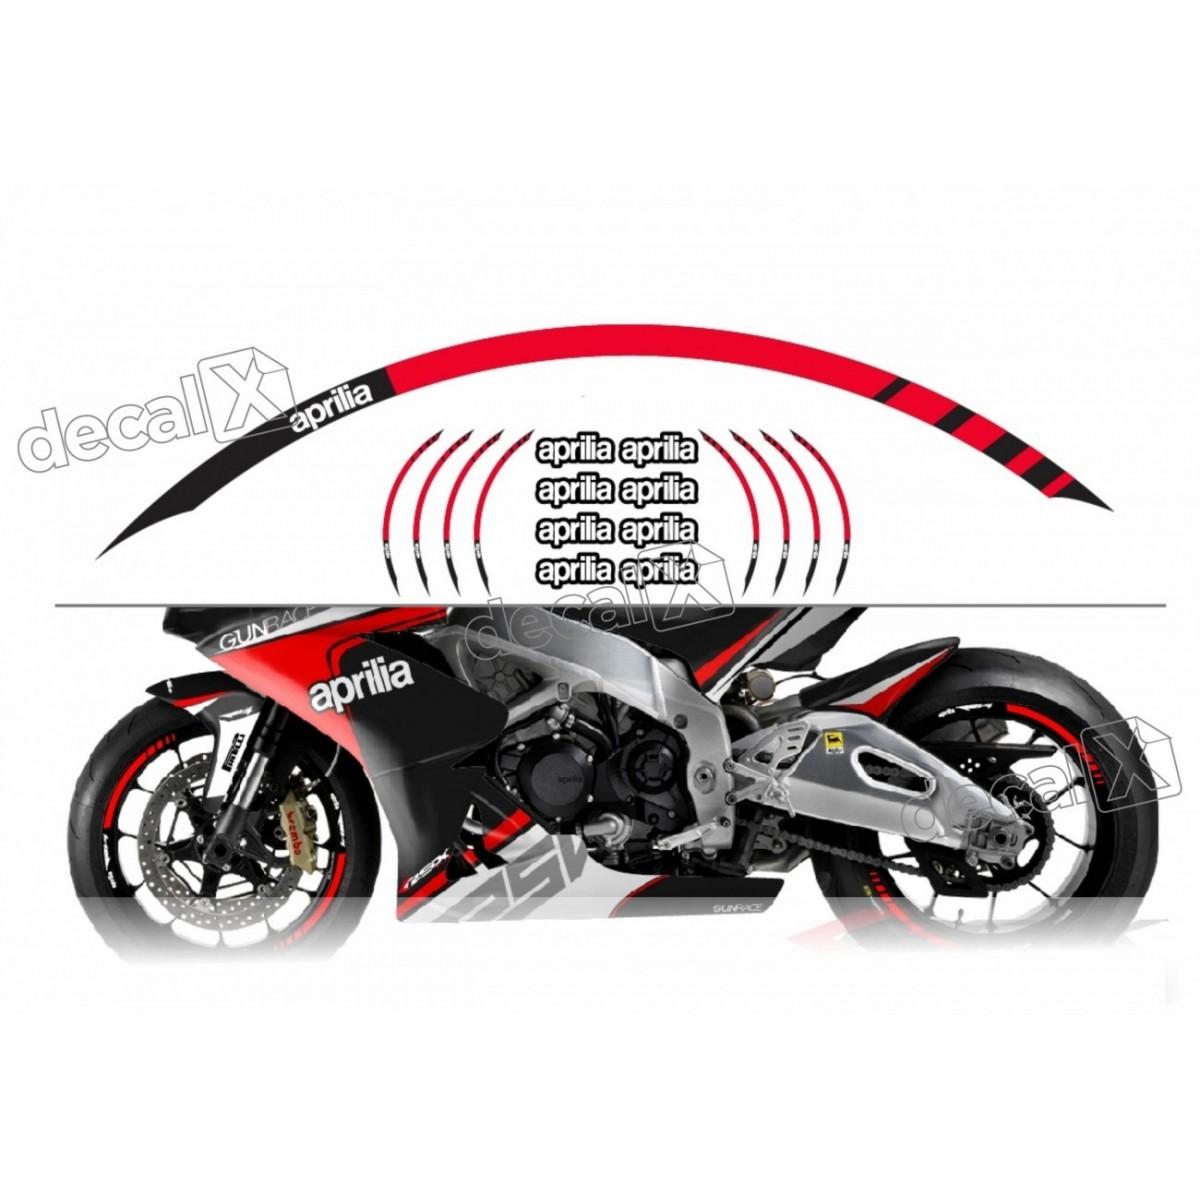 Kit Adesivo Friso Refletivo Roda Moto Aprilia Fri01 Decalx